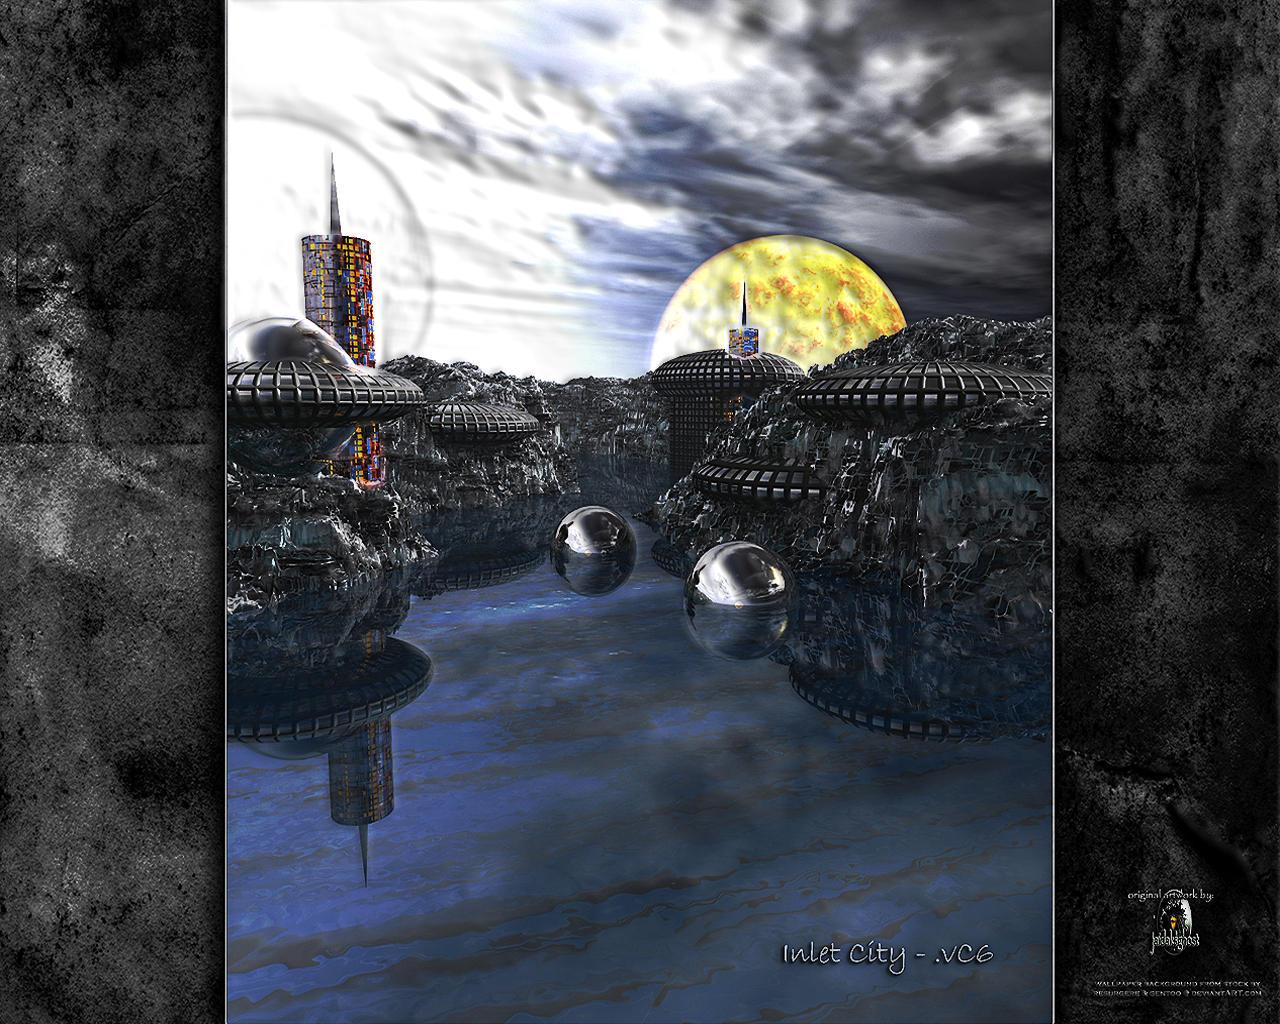 inlet city - very dark by jaidaksghost